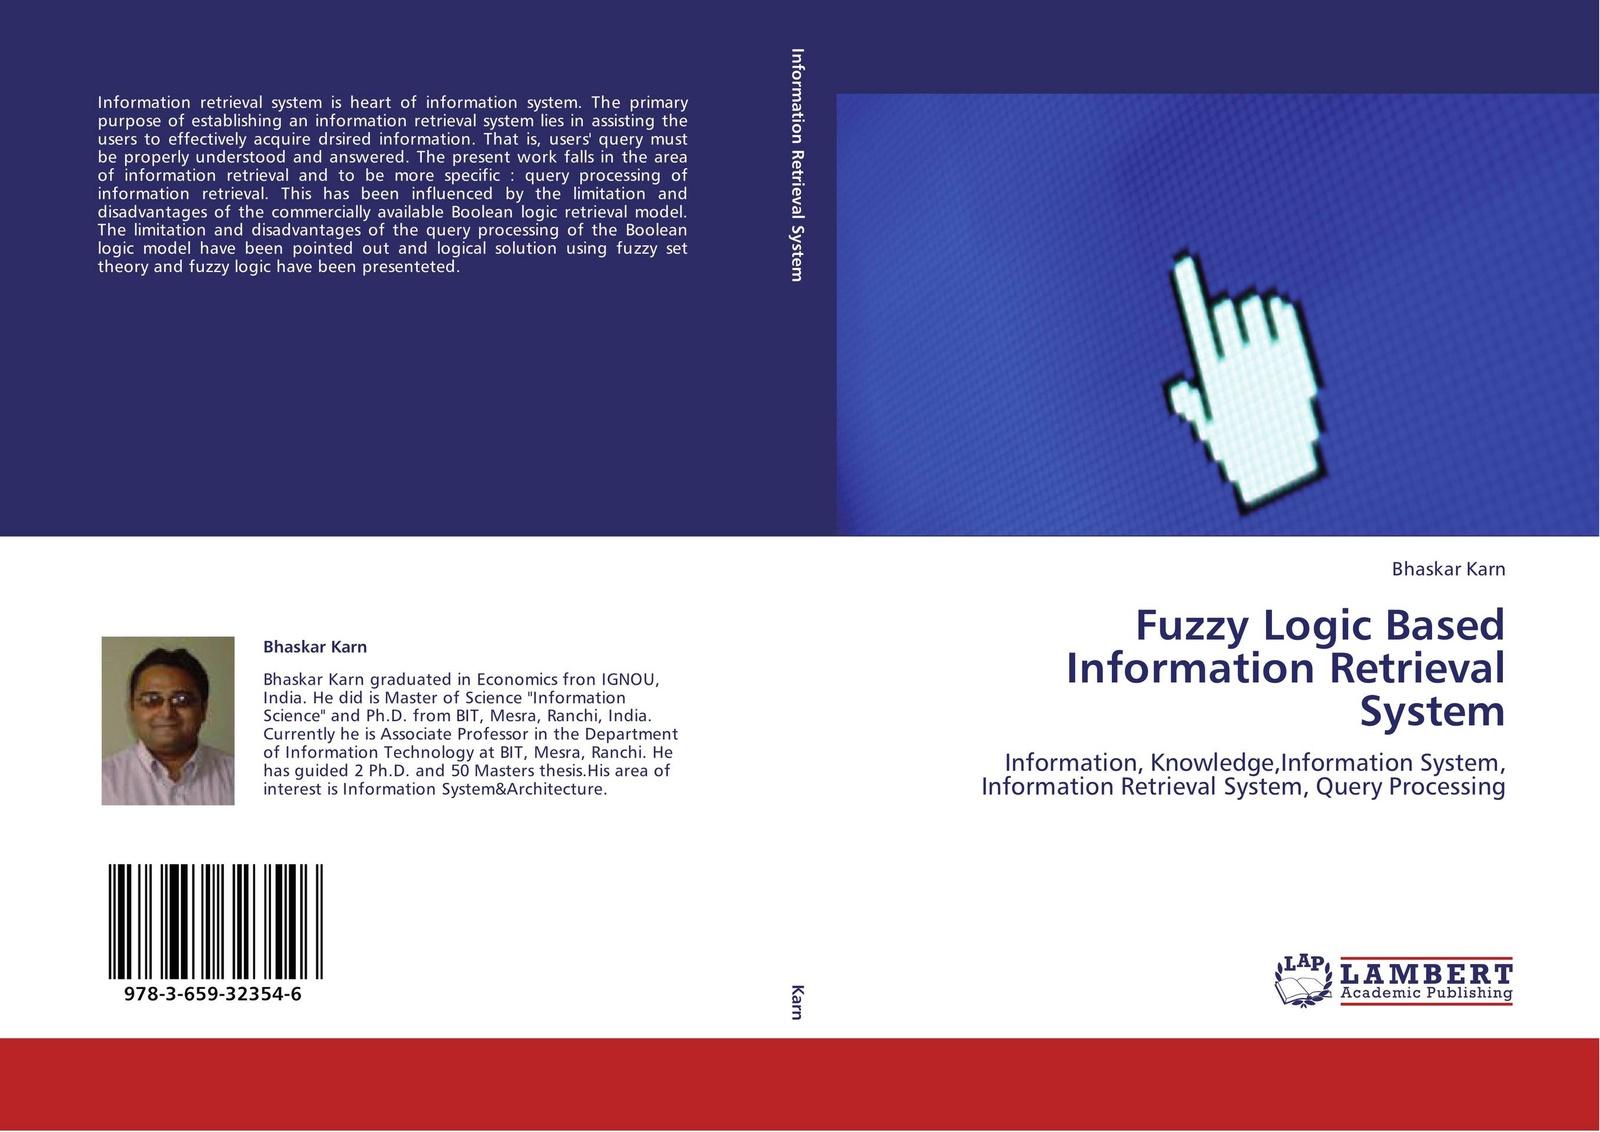 Bhaskar Karn Fuzzy Logic Based Information Retrieval System christian sallaberry geographical information retrieval in textual corpora